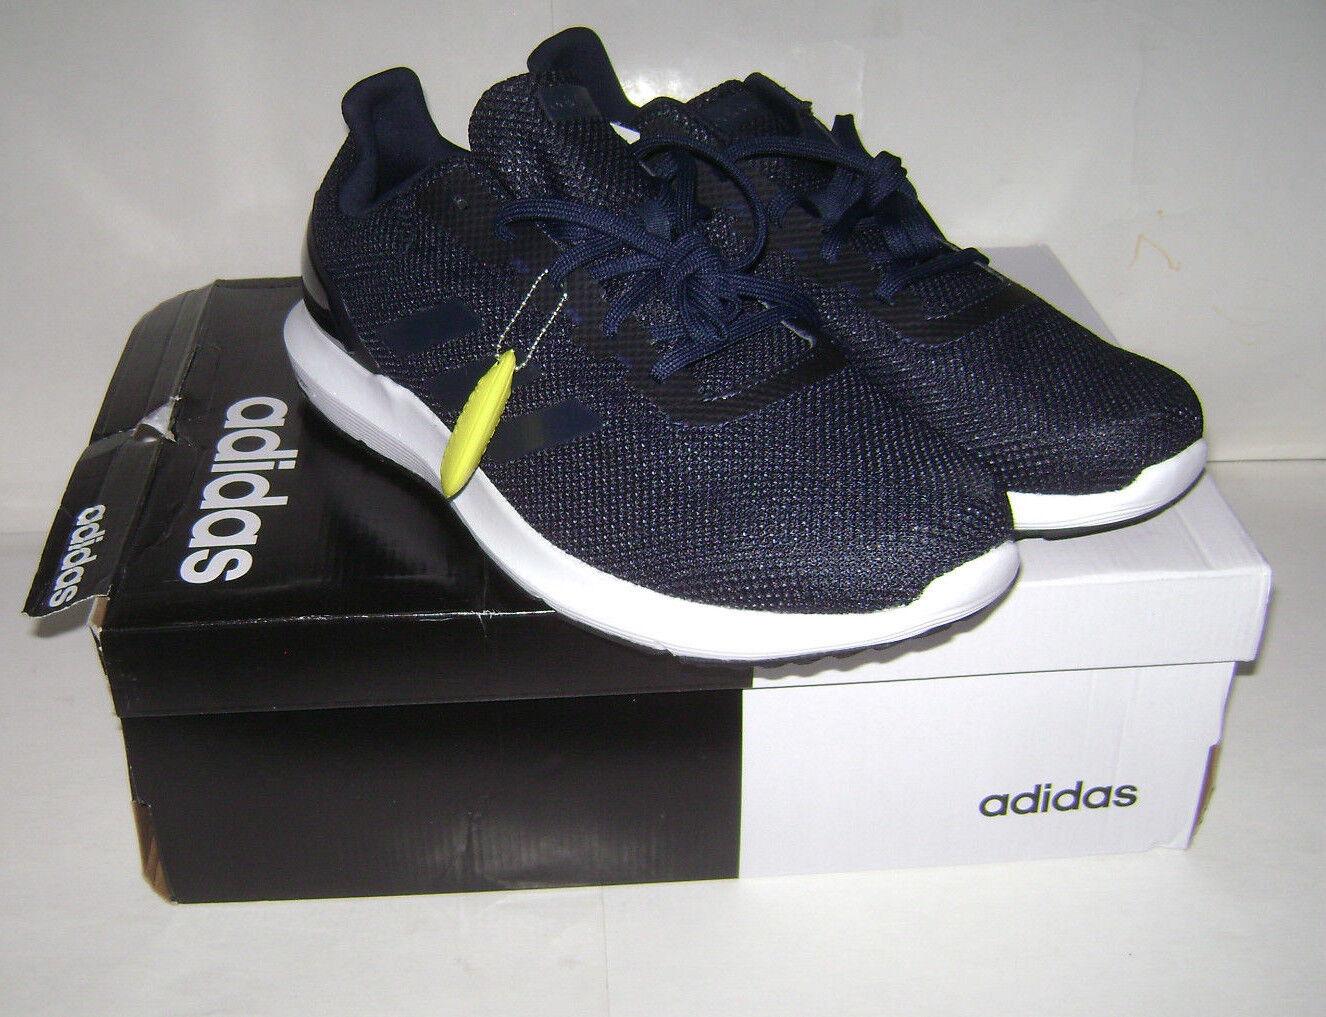 NIB adidas cloudfoam Men COSMIC Sz 2 Running Sneakers Shoes Sz COSMIC 11.5 Blue DB1757 993466